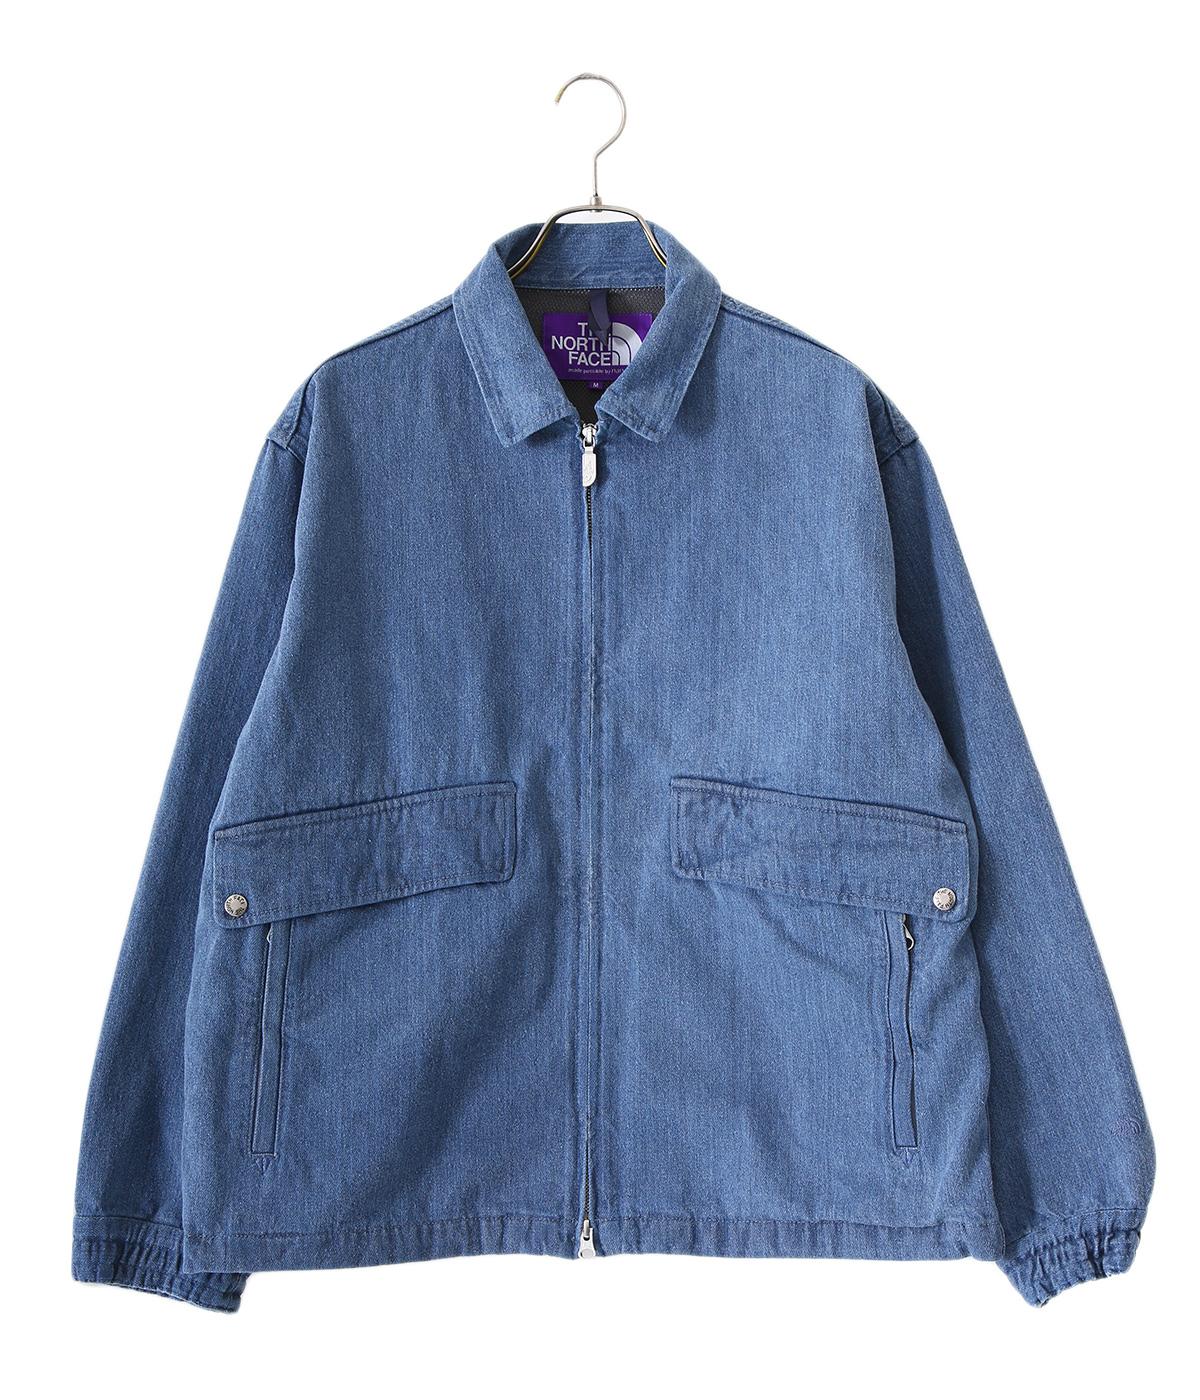 【予約】Denim Field Jacket